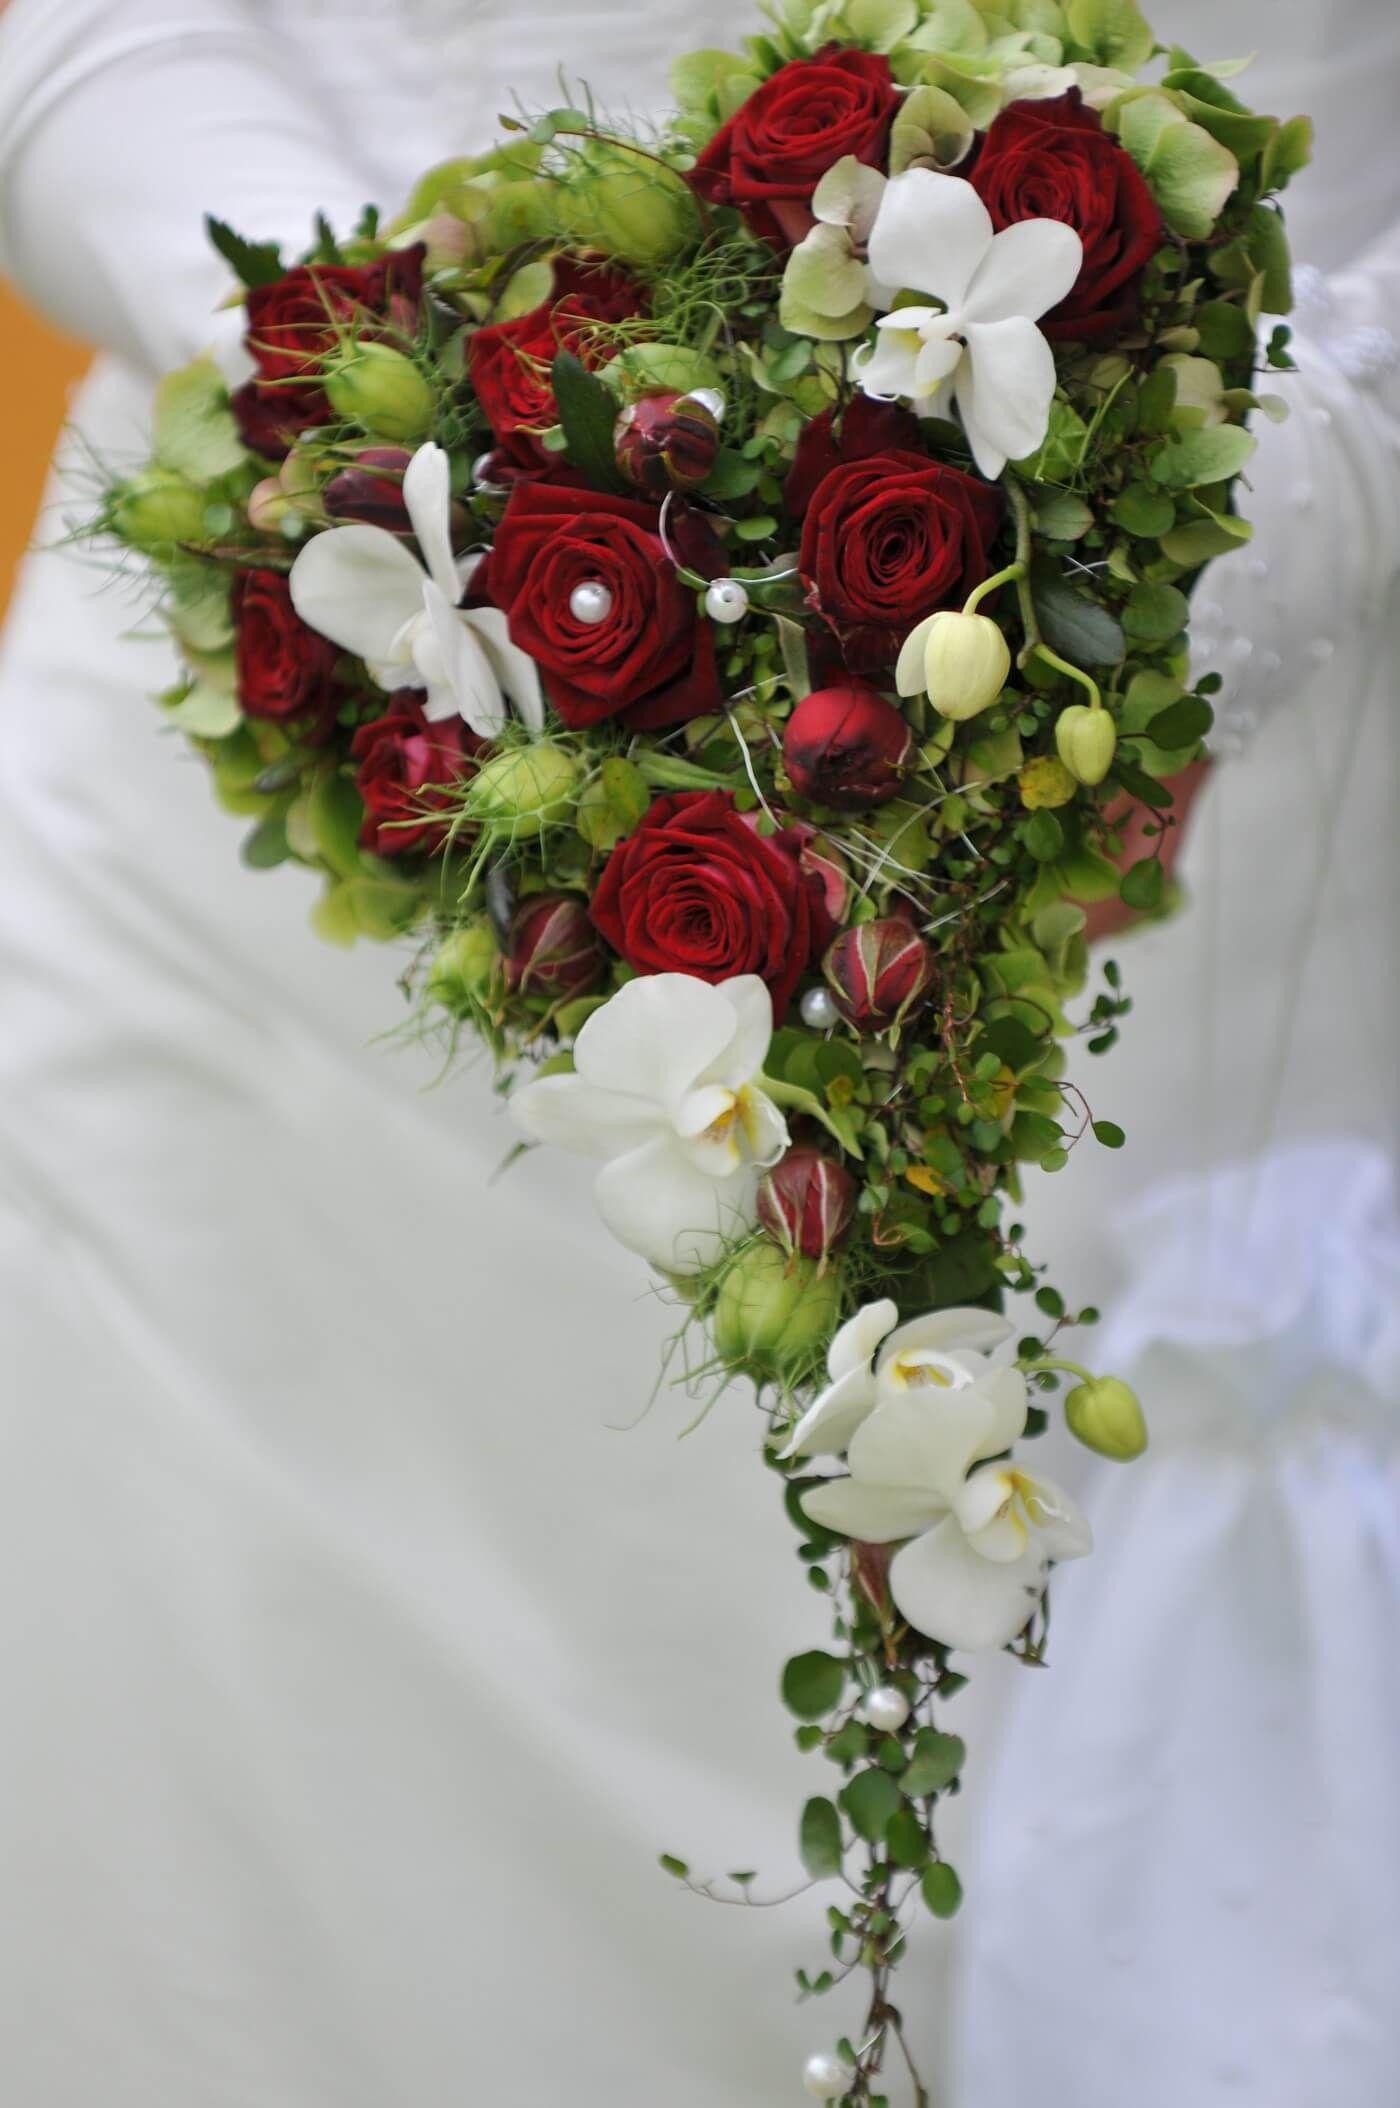 Brautstrau in Herzform  Bildergalerie  Heart Bouquet